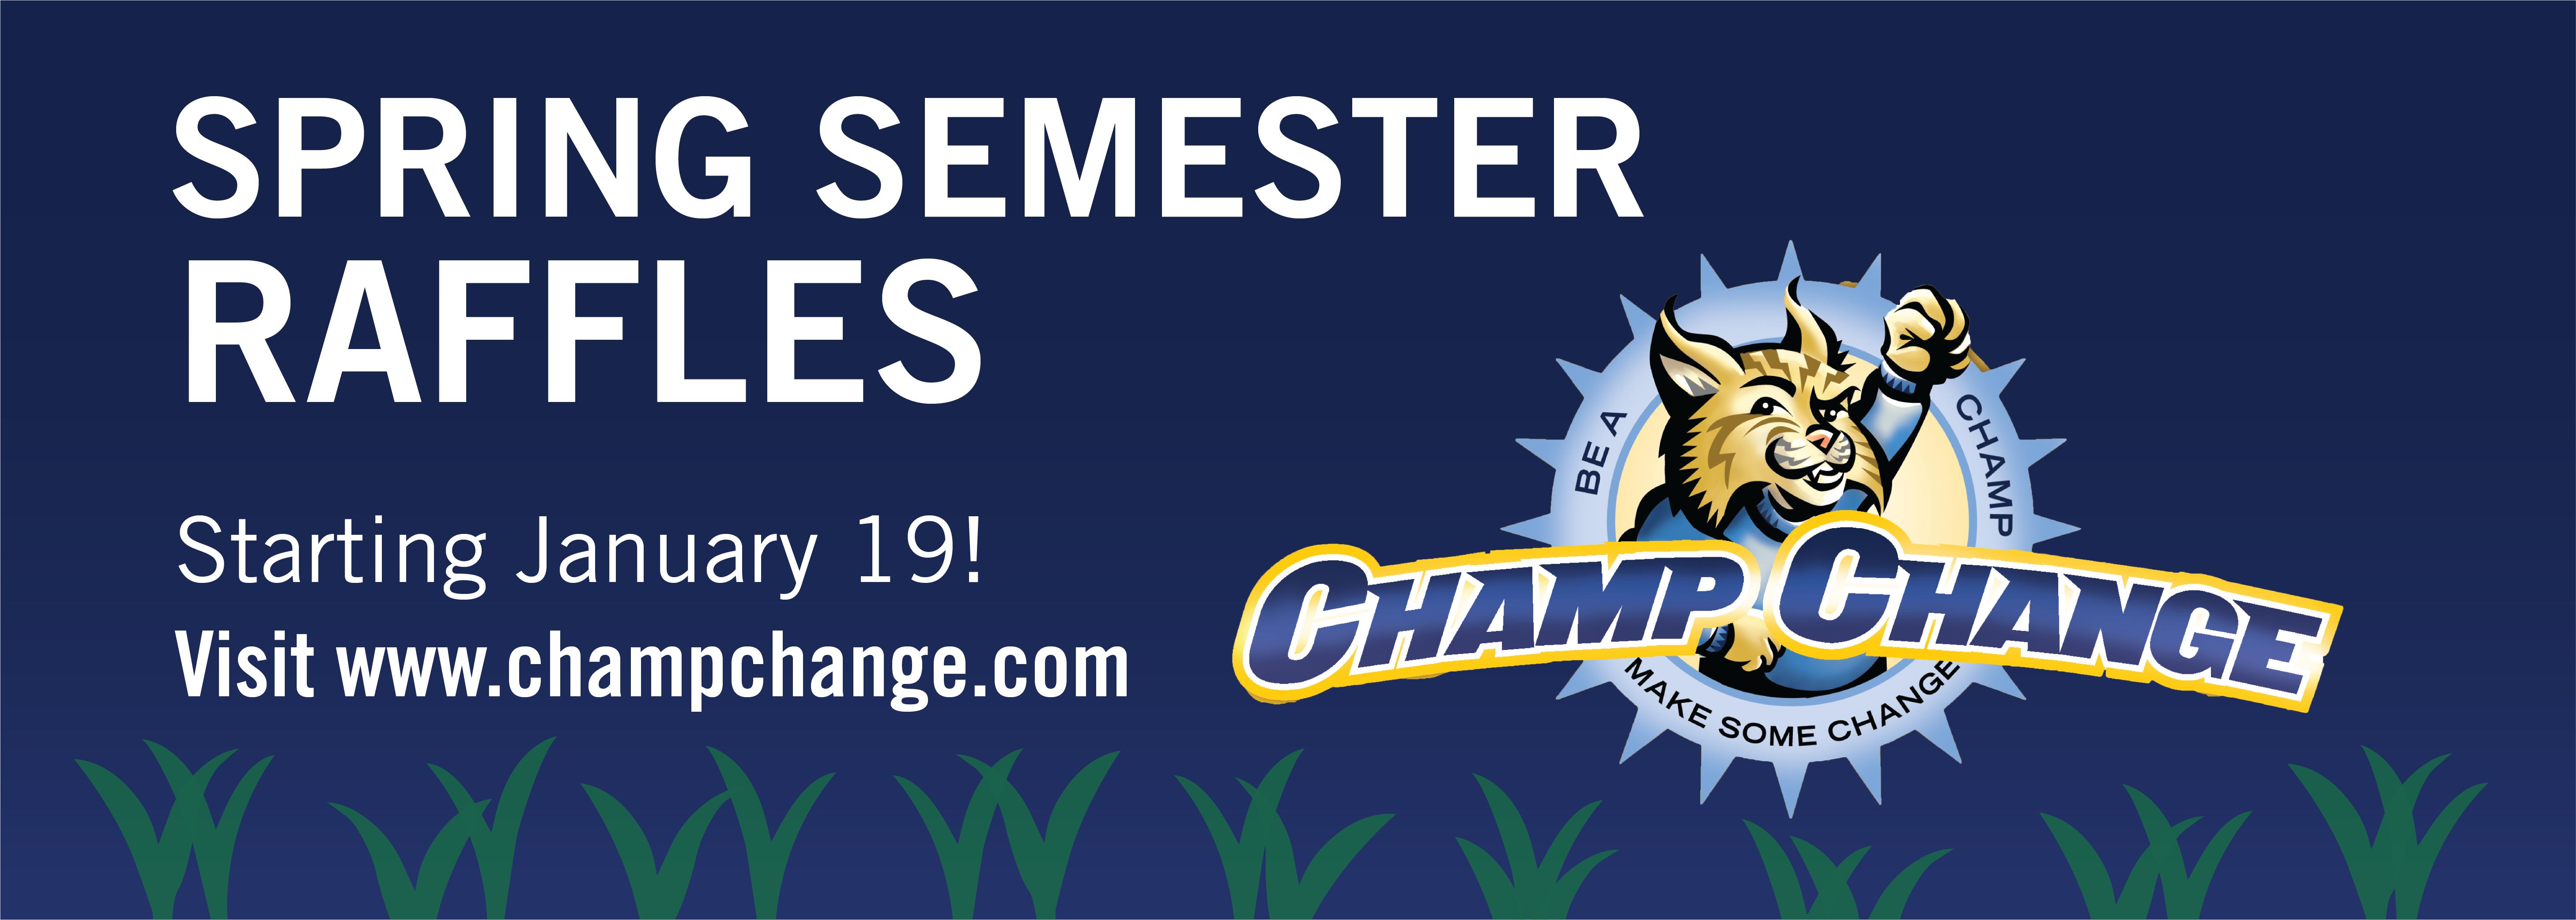 Spring Semester Raffles! Starting January 19! Visit www.champchange.com